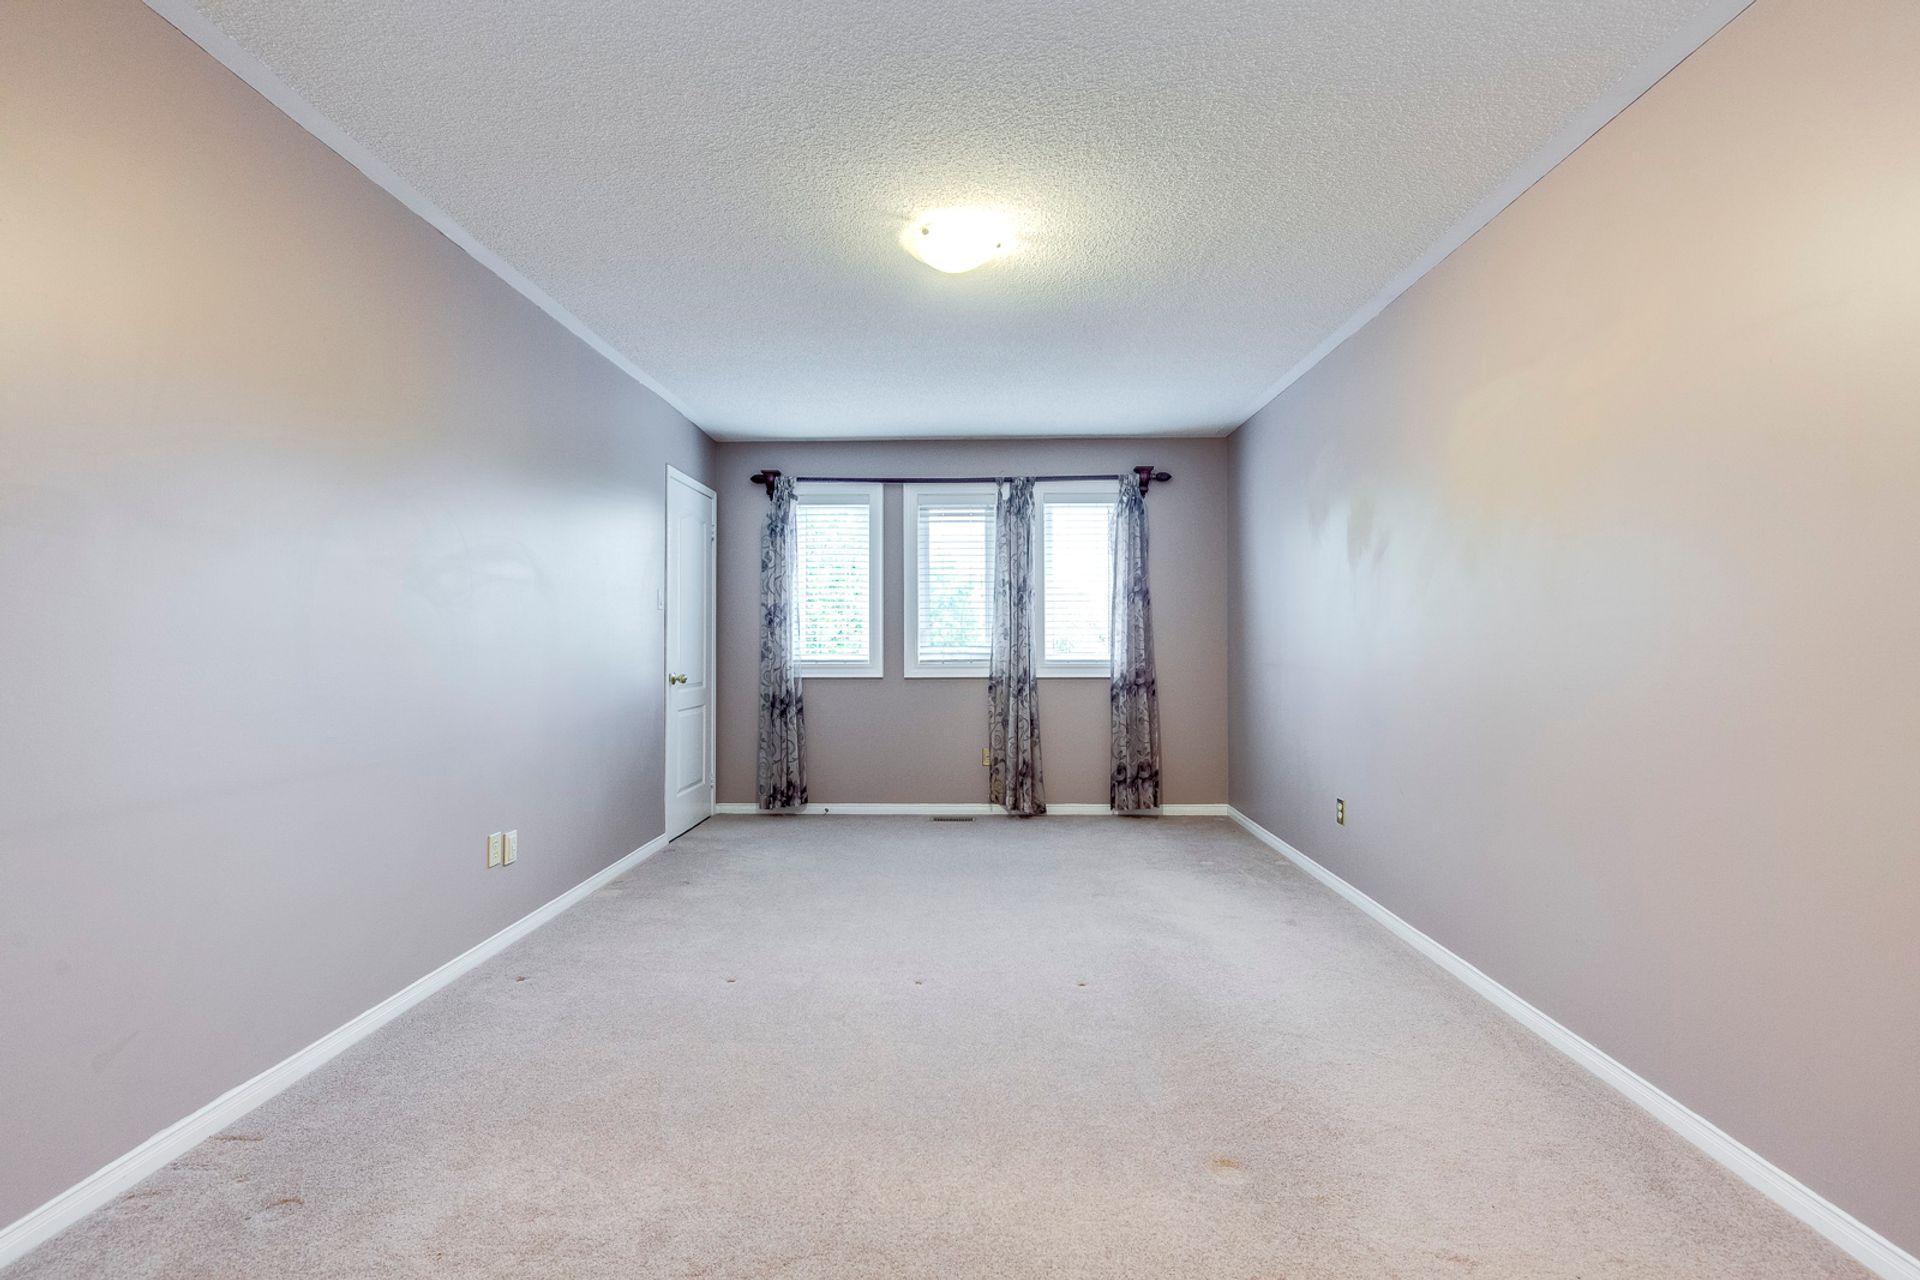 Master Bedroom - 1522 Estes Cres, Mississauga - Elite3 & Team at 1522 Estes Crescent, East Credit, Mississauga